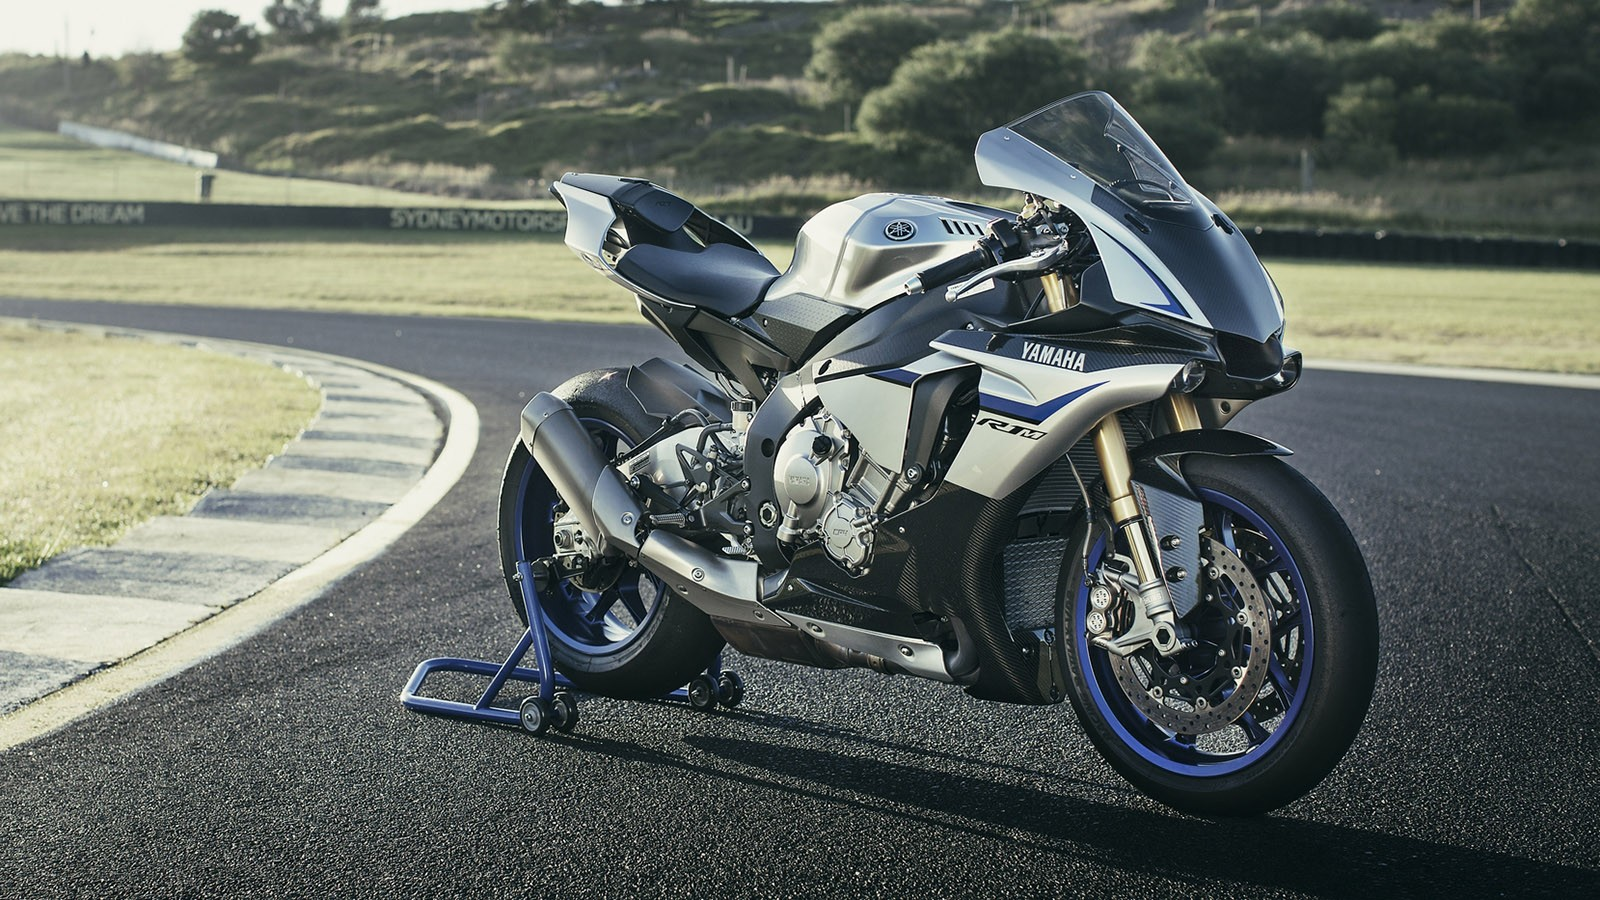 2015-Yamaha-YZF1000R1SPL-EU-Silver-Blu-Carbon-Static-001